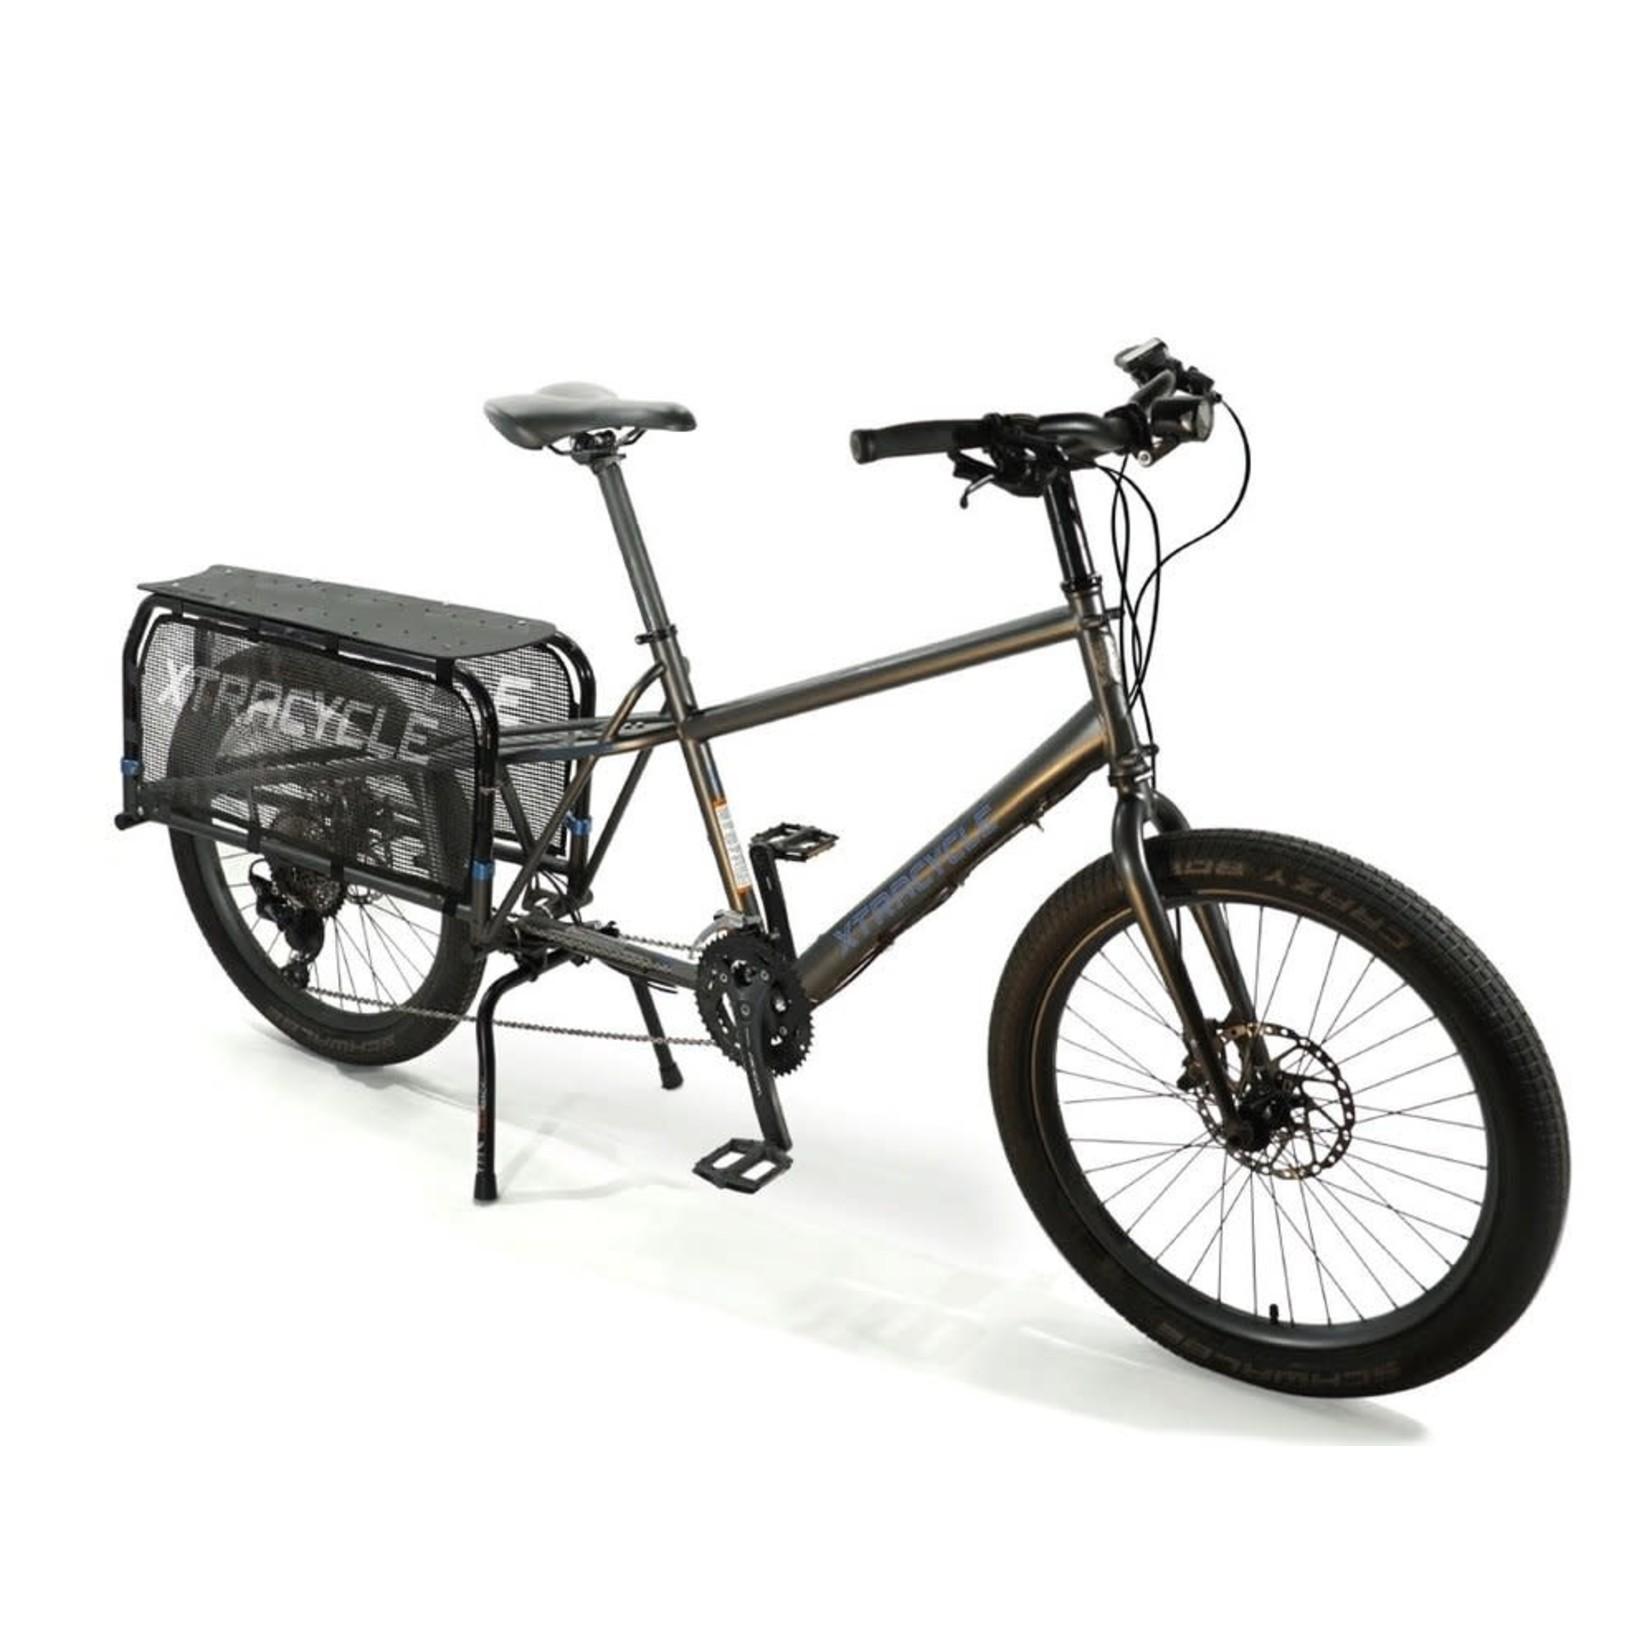 Xtracycle Xtracycle eStoker, Bosch CX, Dual-Battery